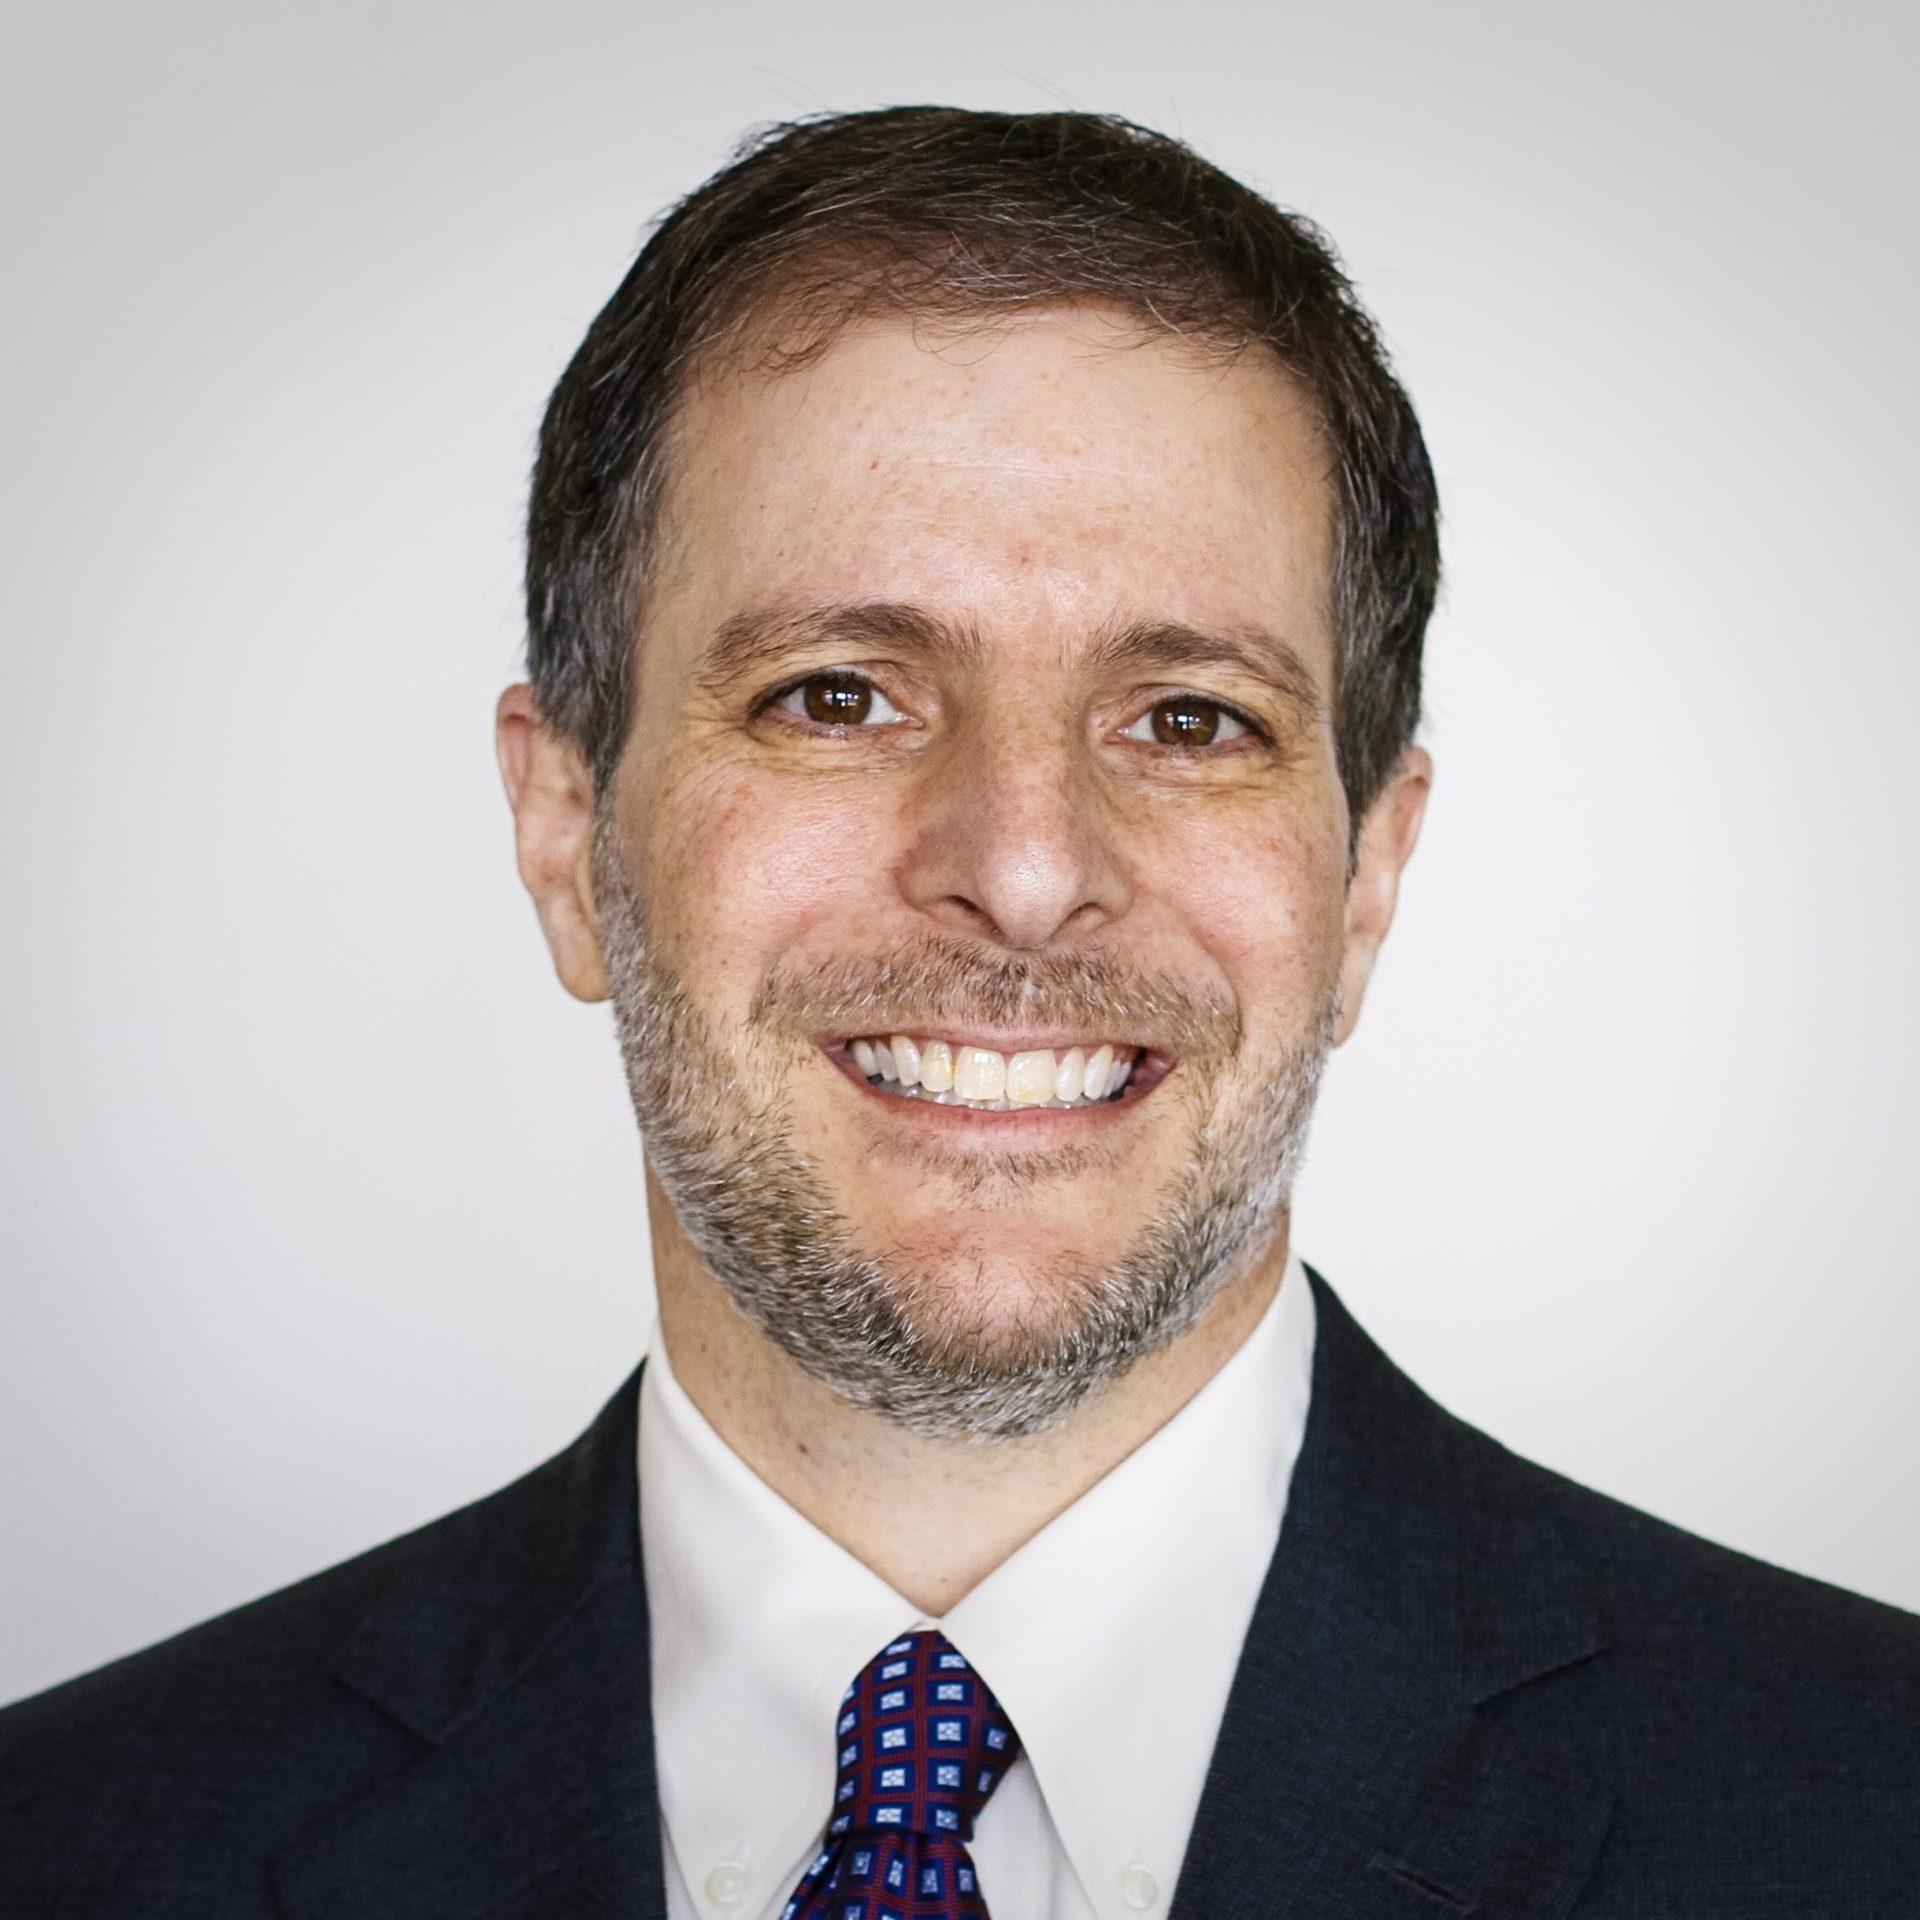 David Kochman